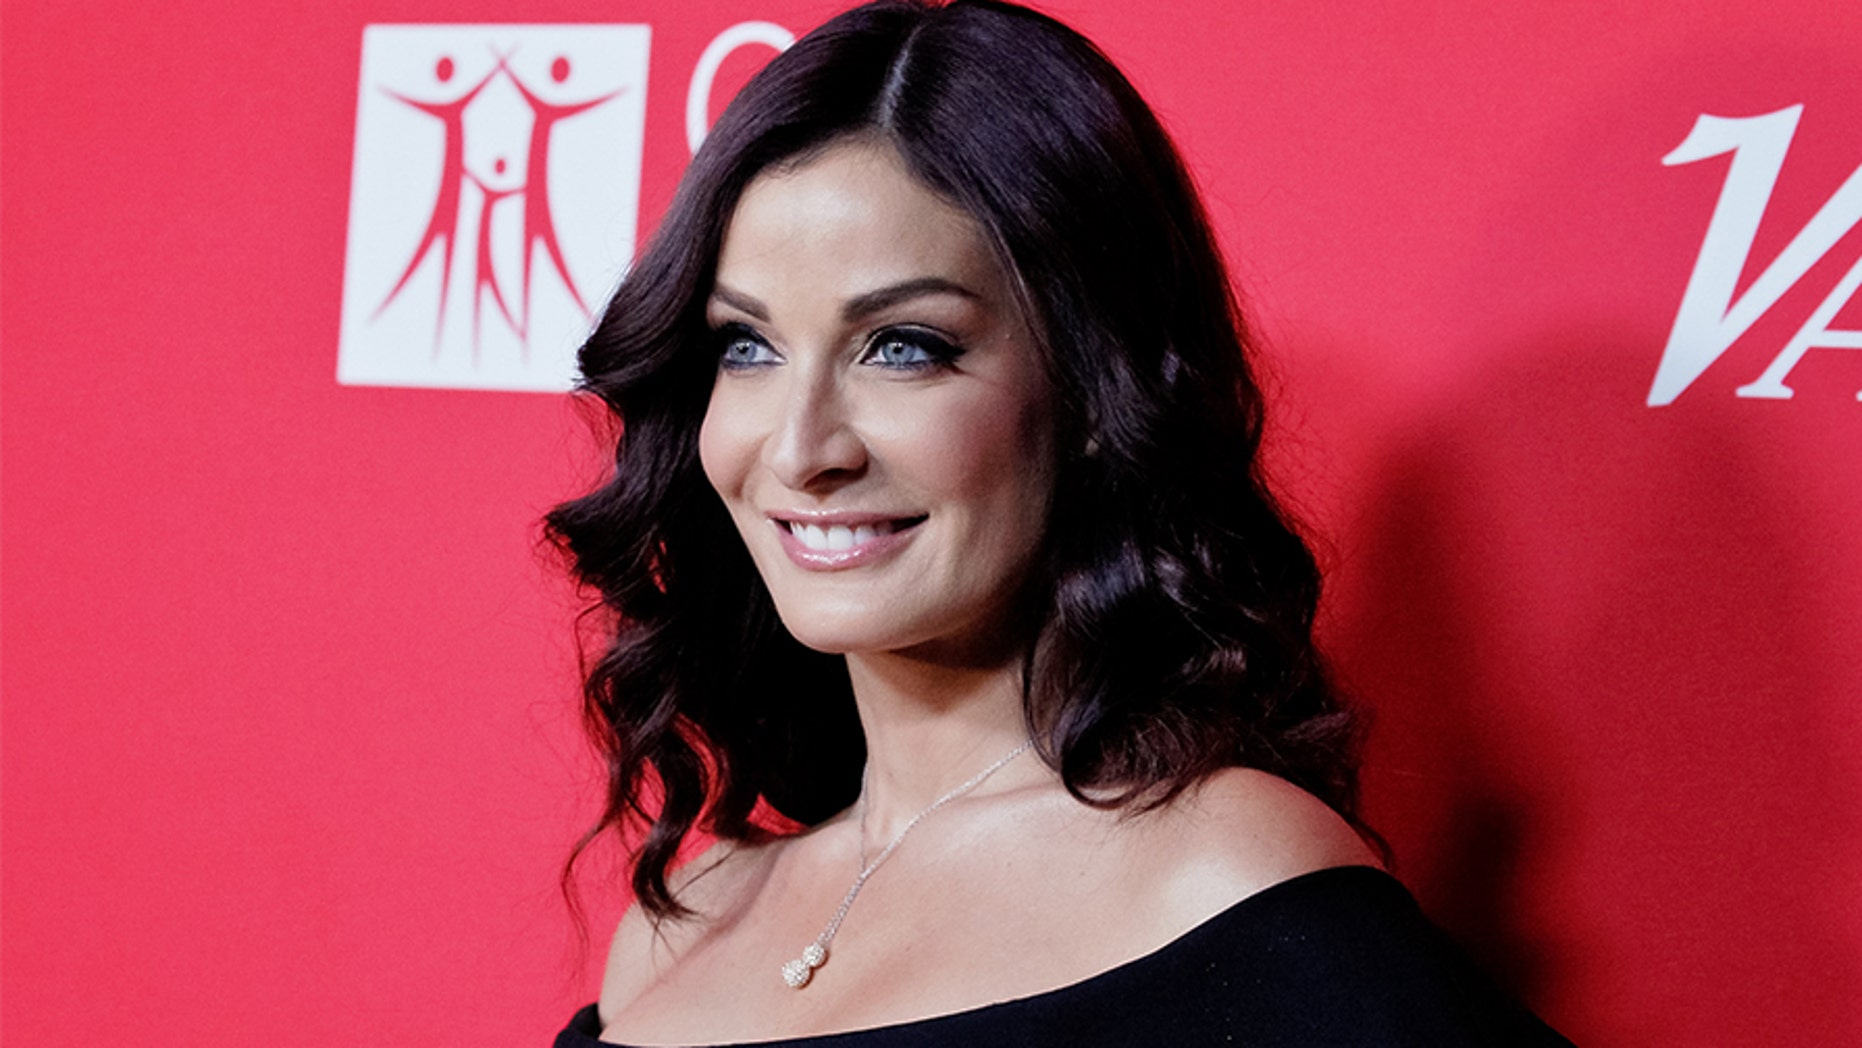 Dayanara Torres said on social media that she has skin cancer.